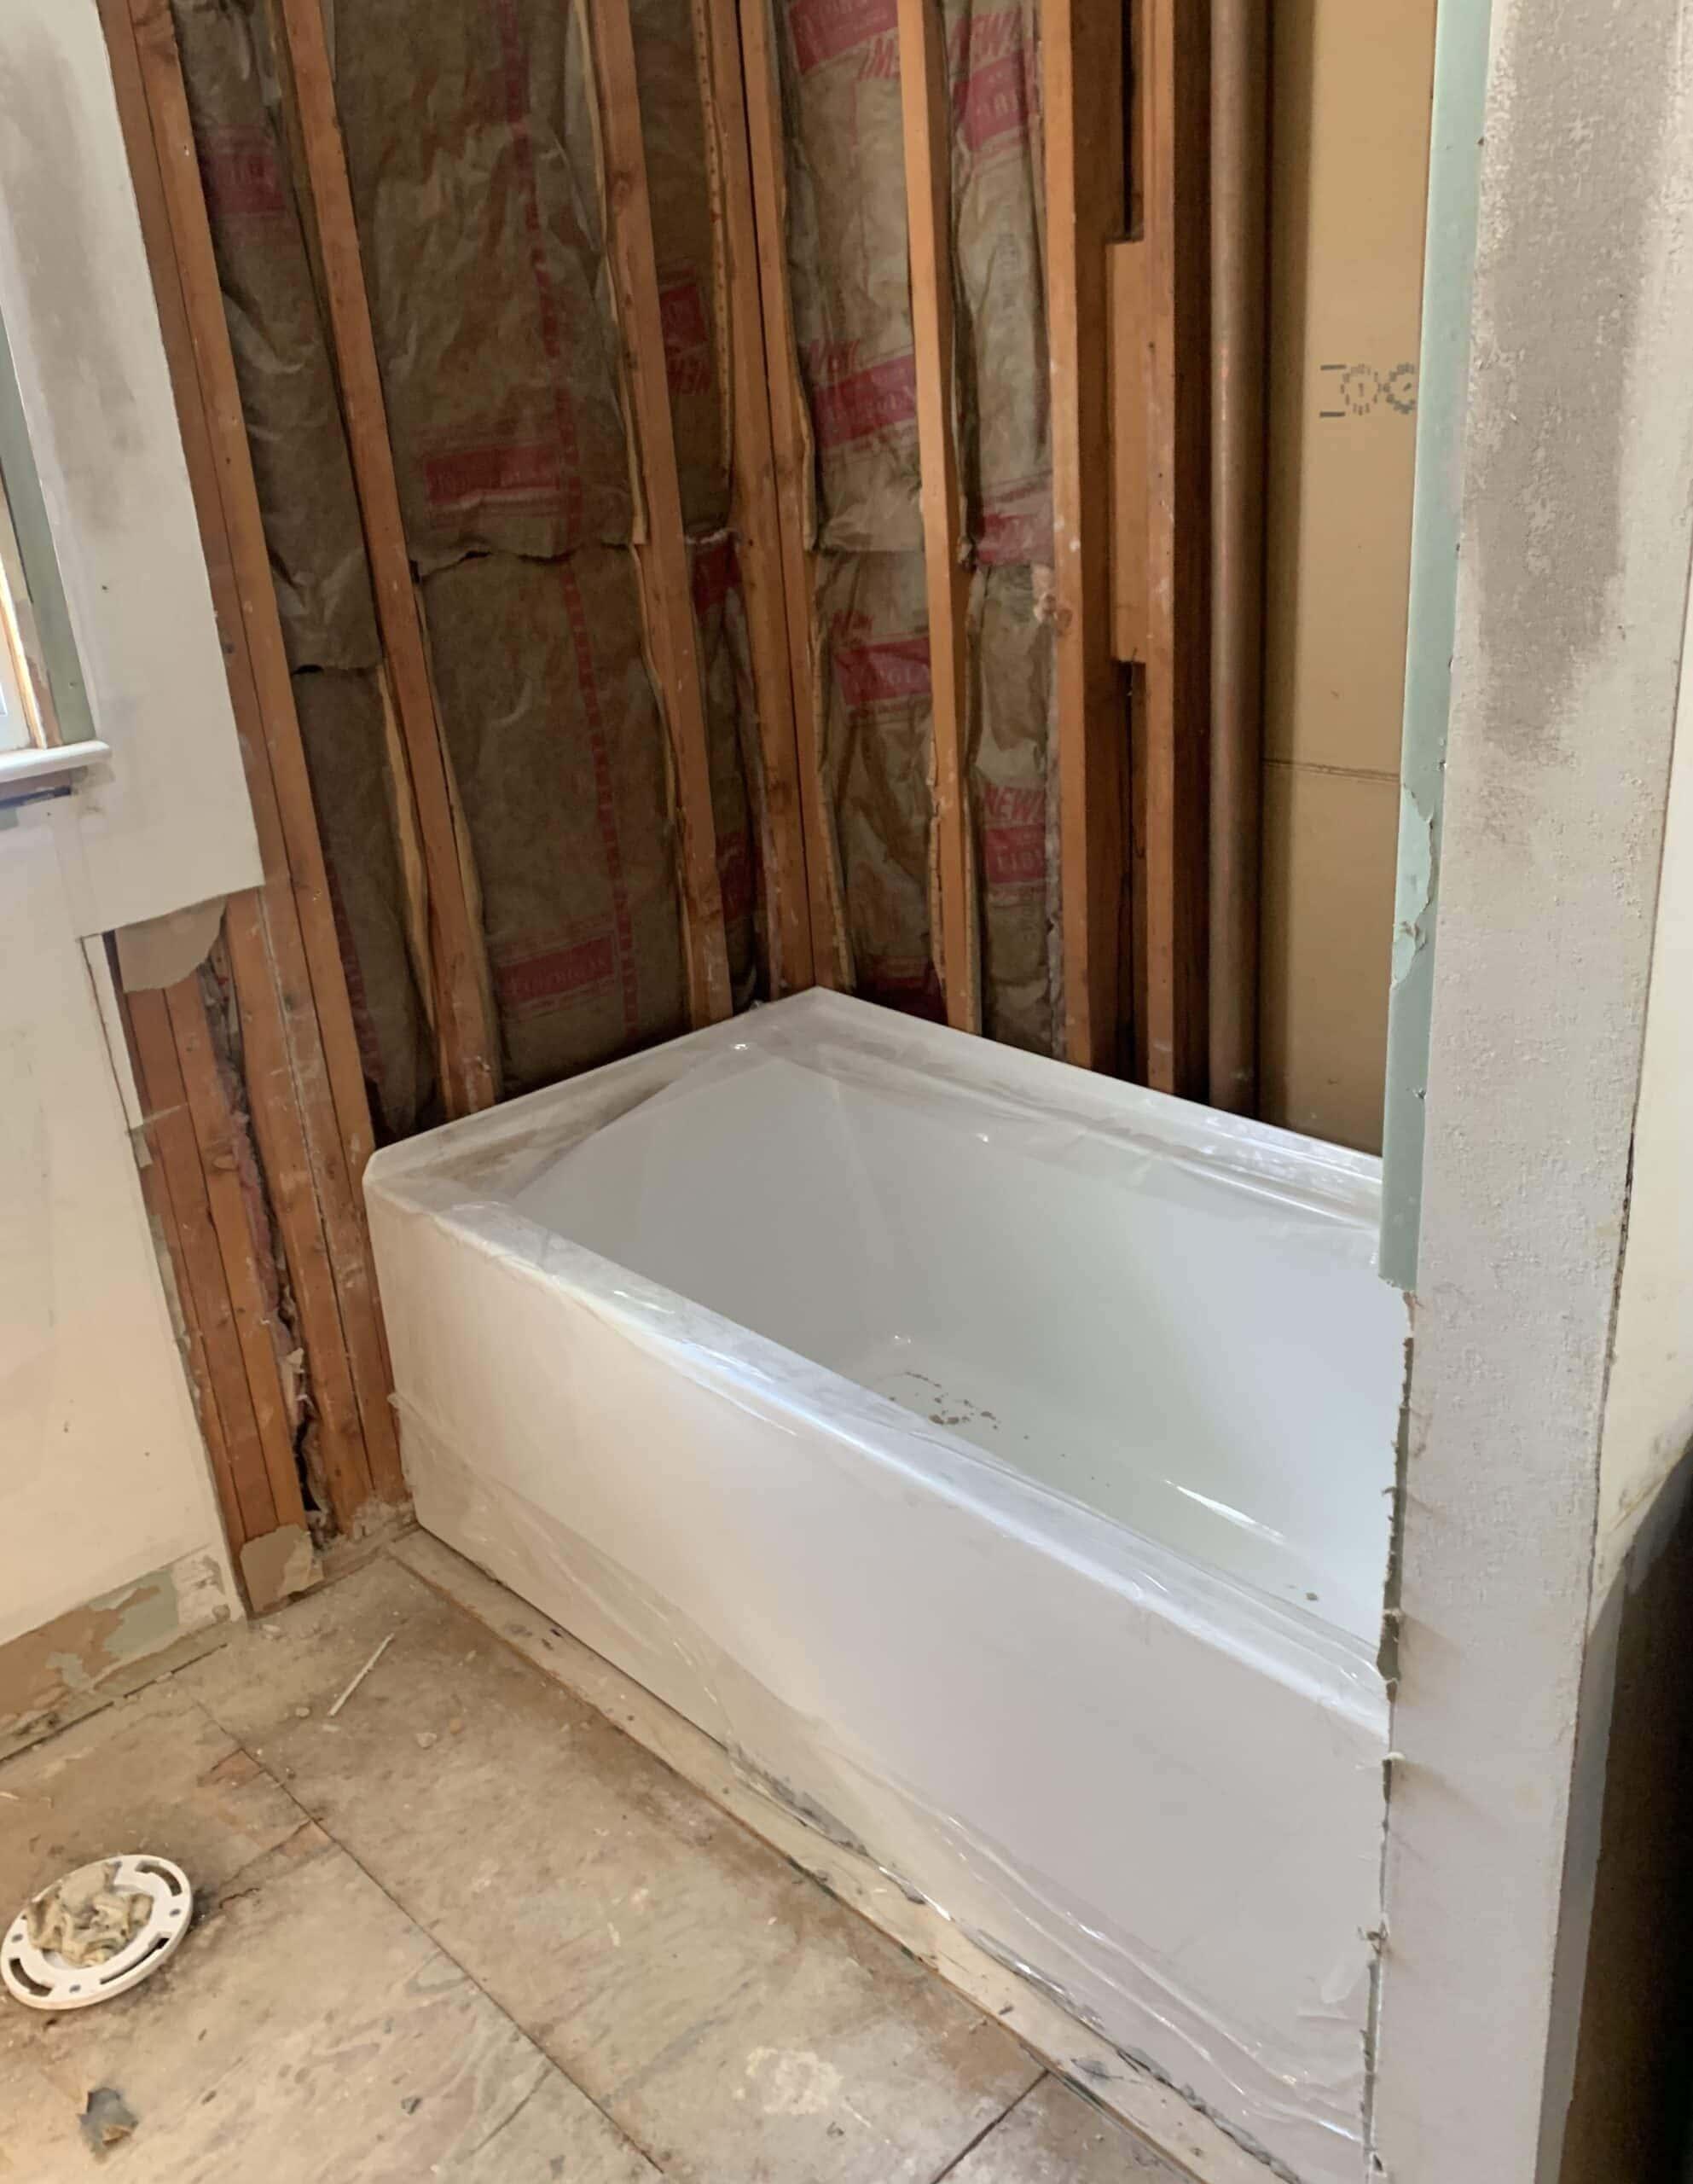 signature-hardware-tub-one-room-challenge